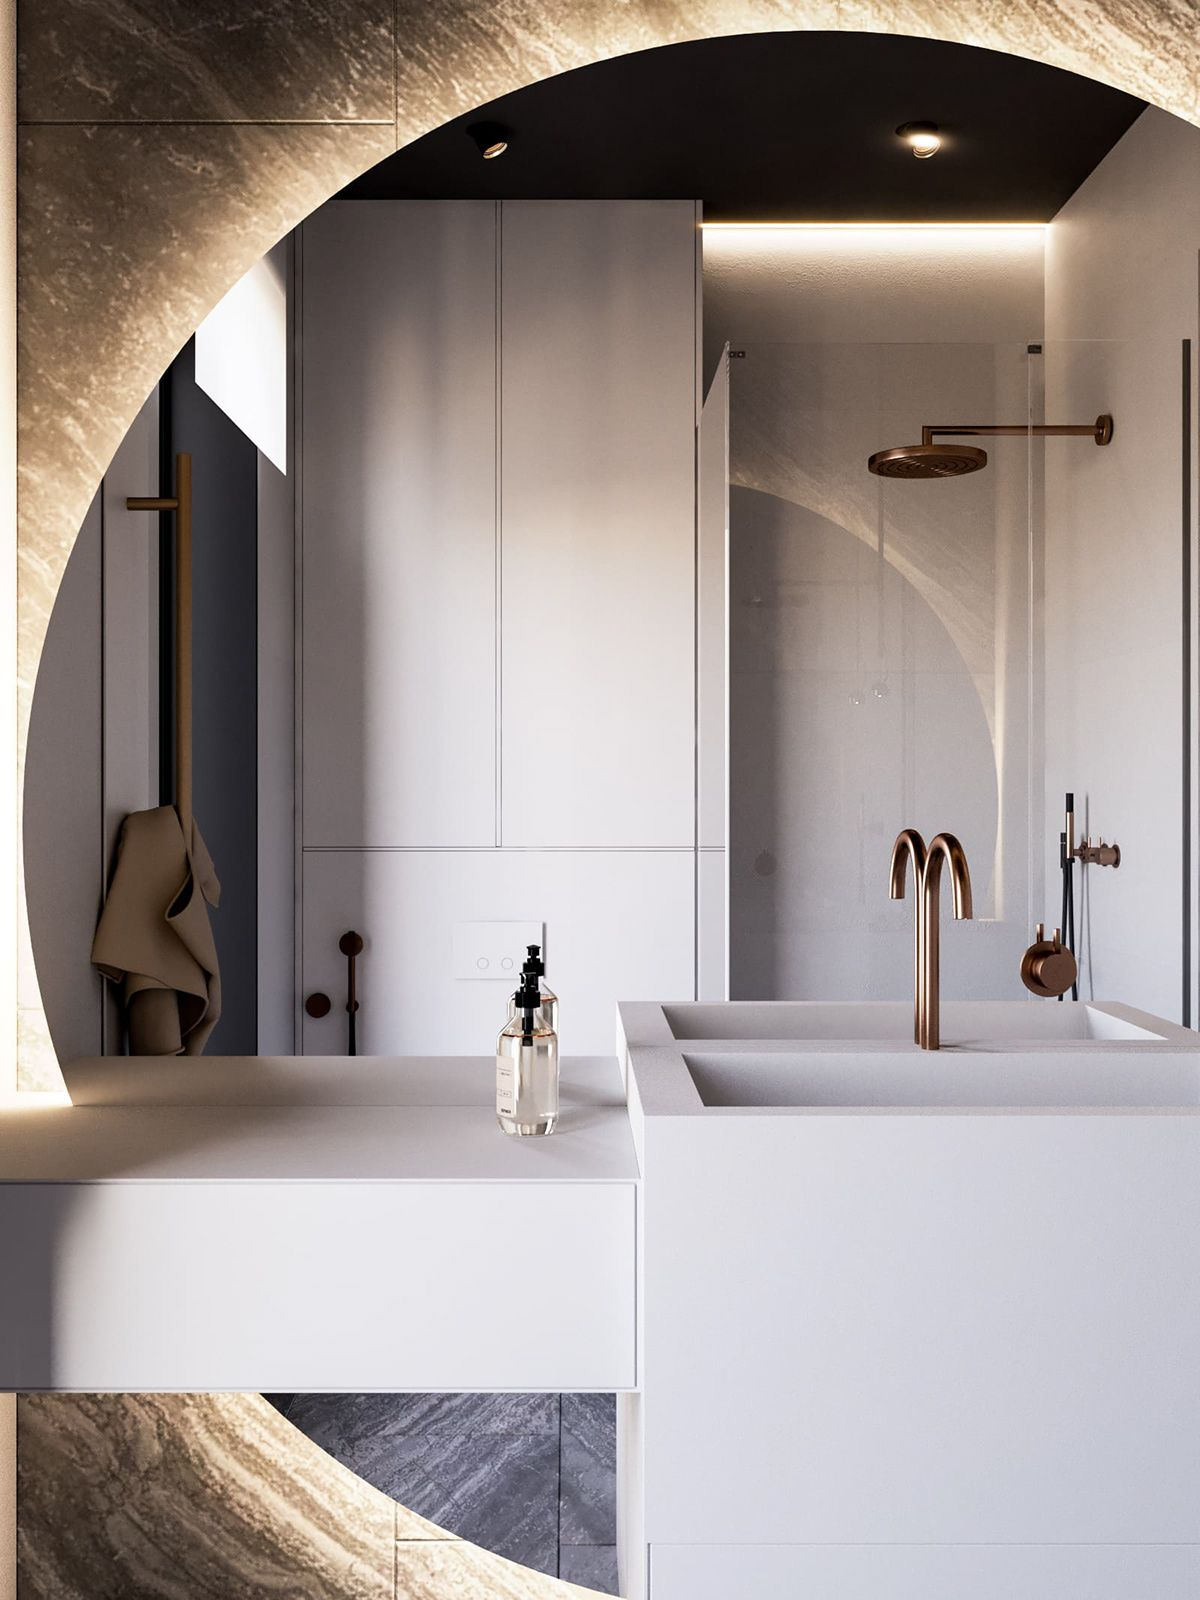 vanity, white built in vanity, big round mirror, golden faucet, brown marble wall